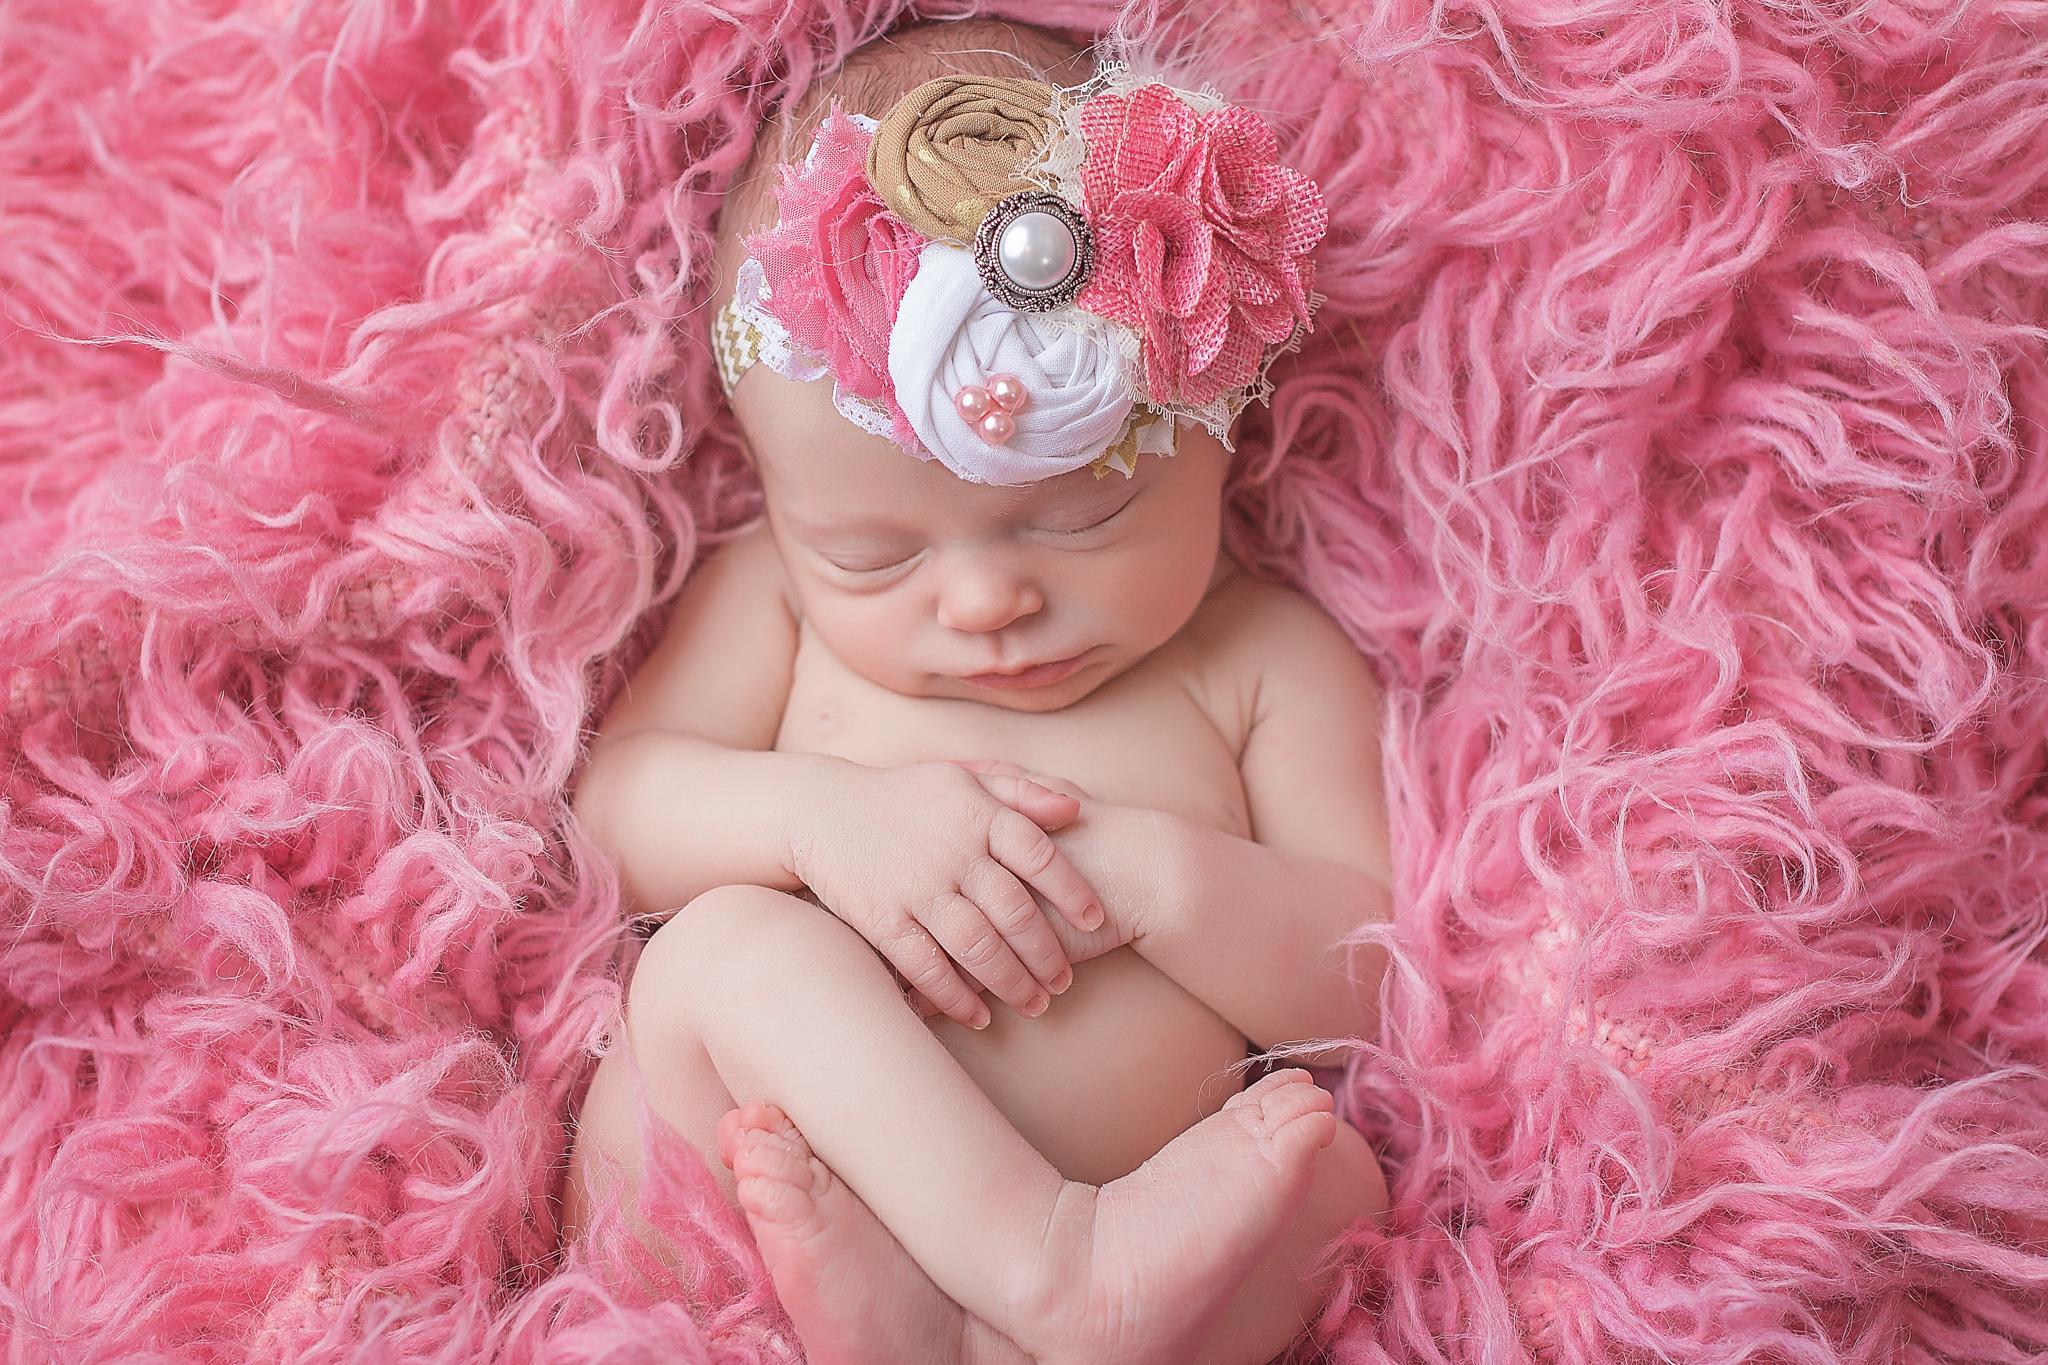 newborn on pink flokati